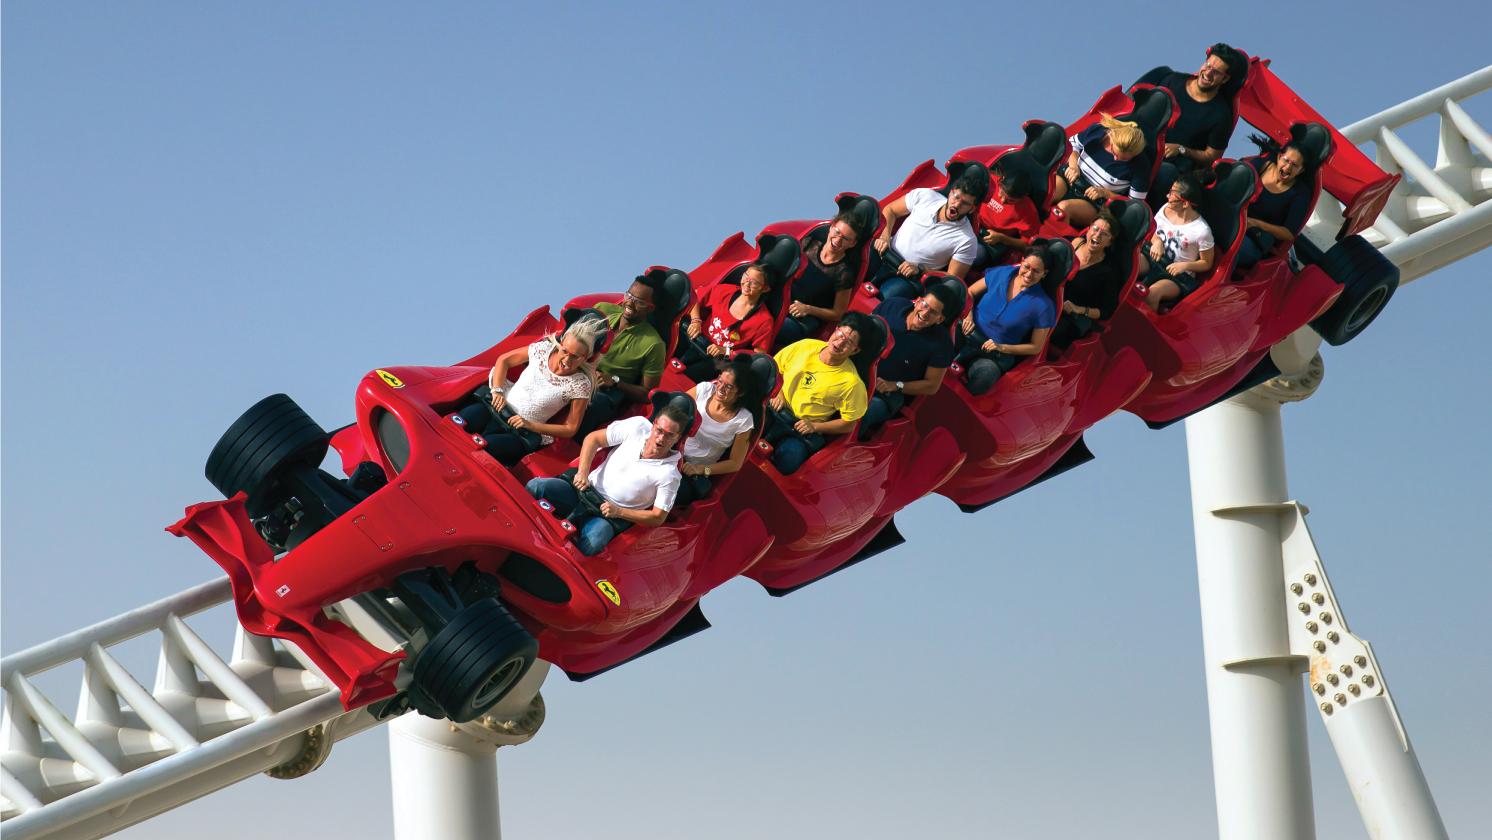 Rides and Attractions - Ferrari World Abu Dhabi